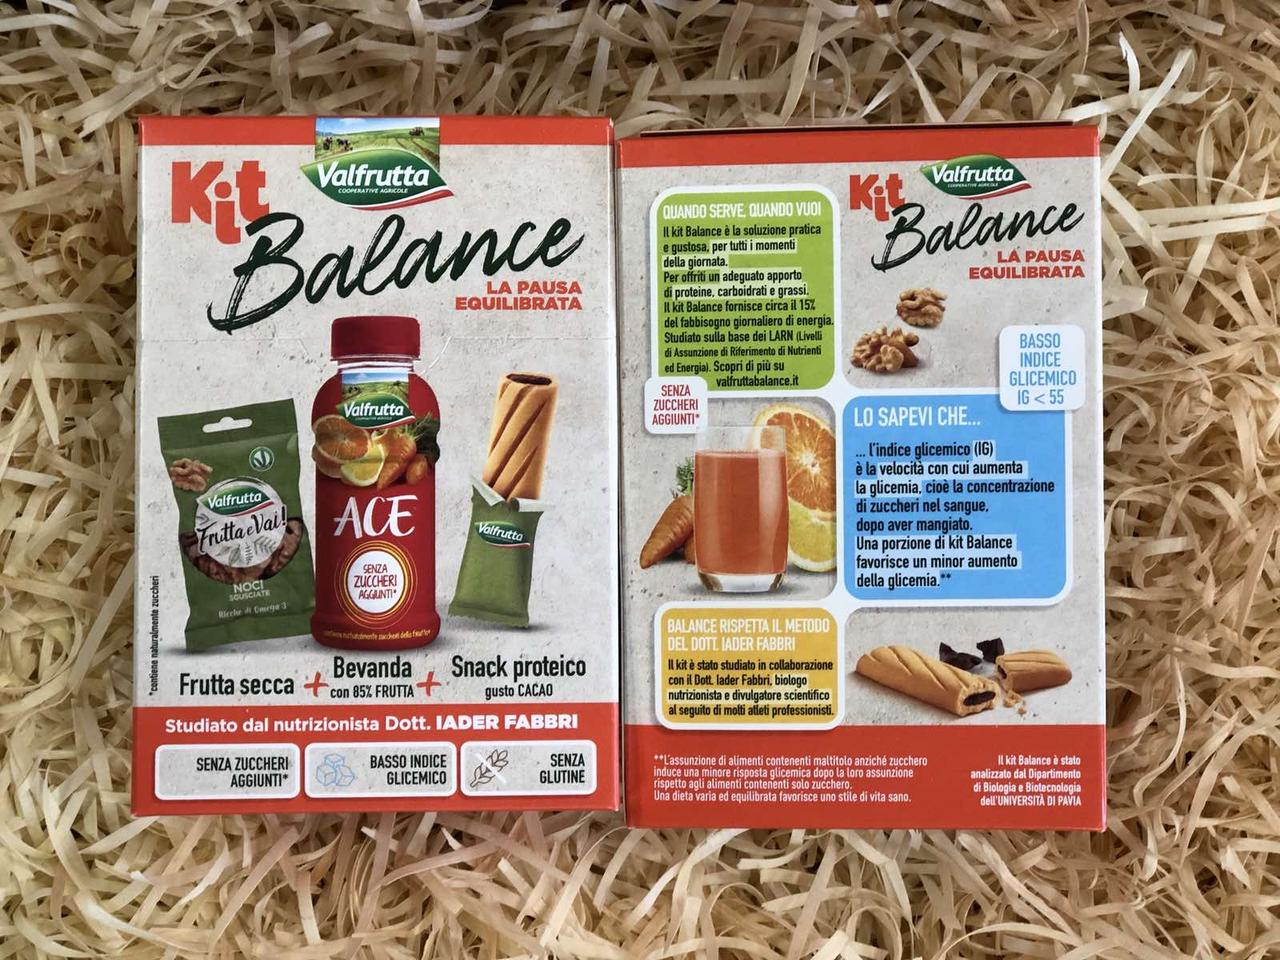 Набор Valfrutta Kit Balance с грецкими орехами